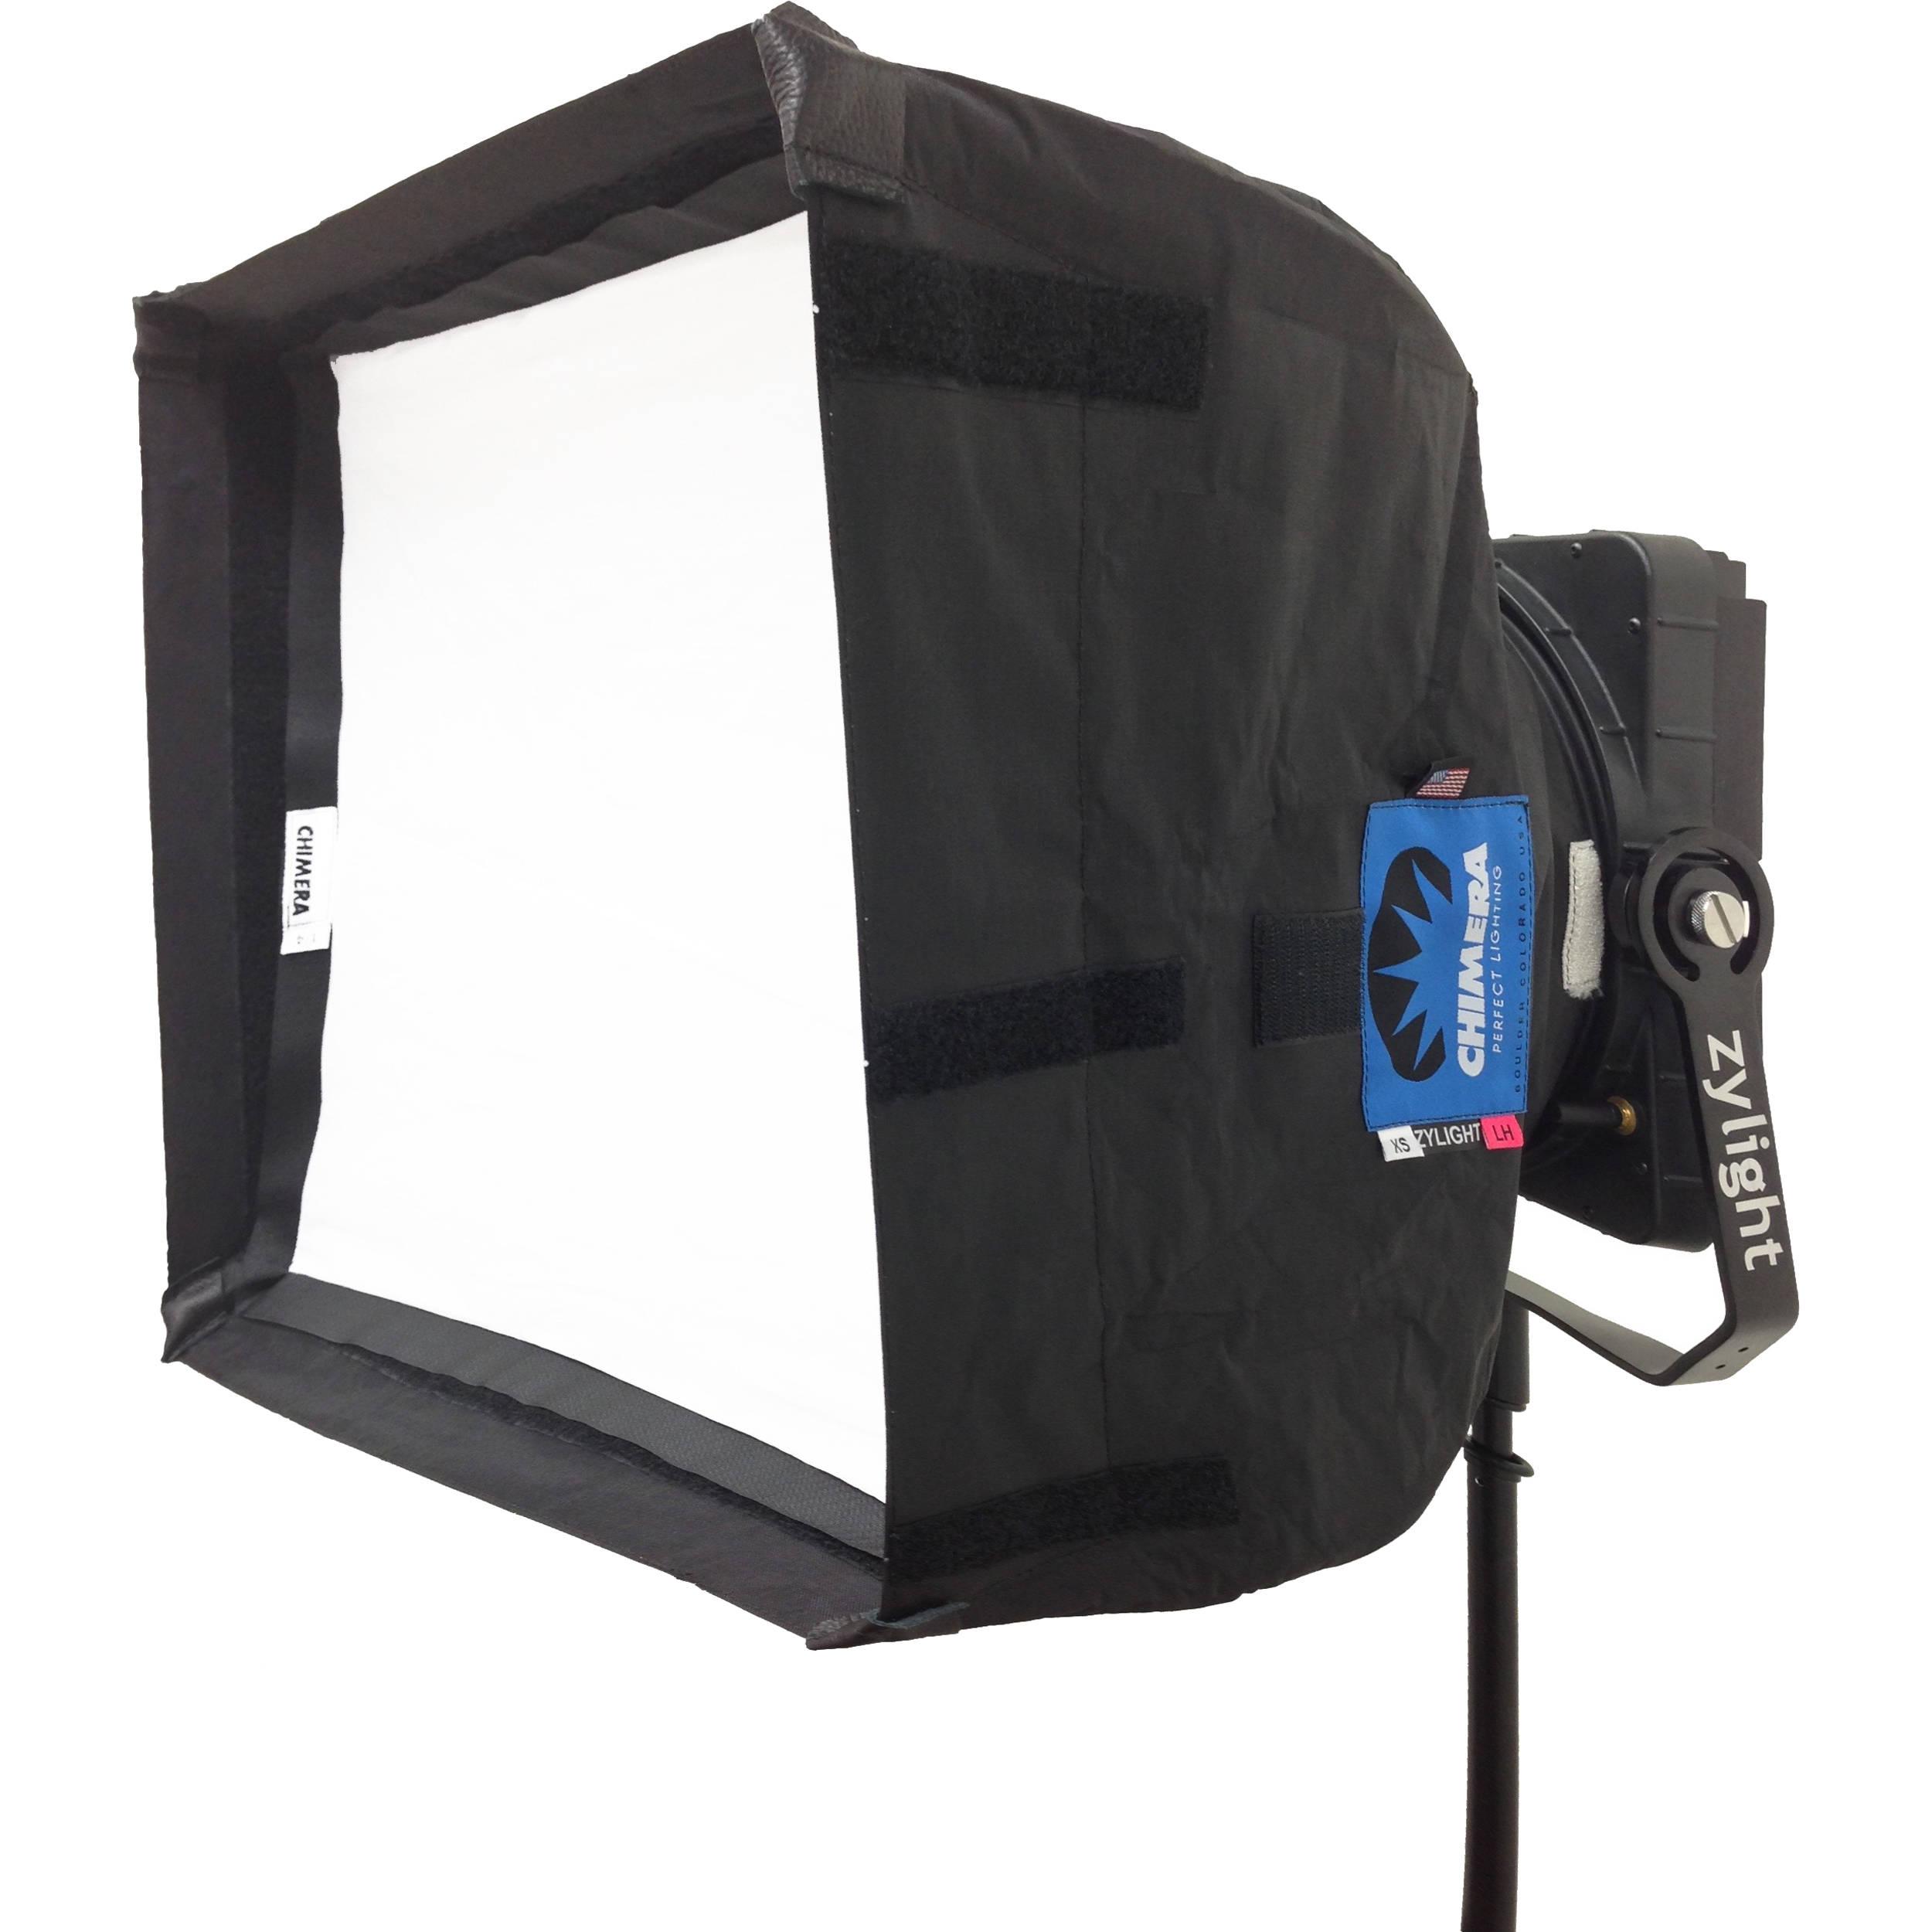 Shown with Optional Accessories  sc 1 st  Bu0026H & Zylight F8 Chimera Softbox Kit 26-02012 Bu0026H Photo Video azcodes.com